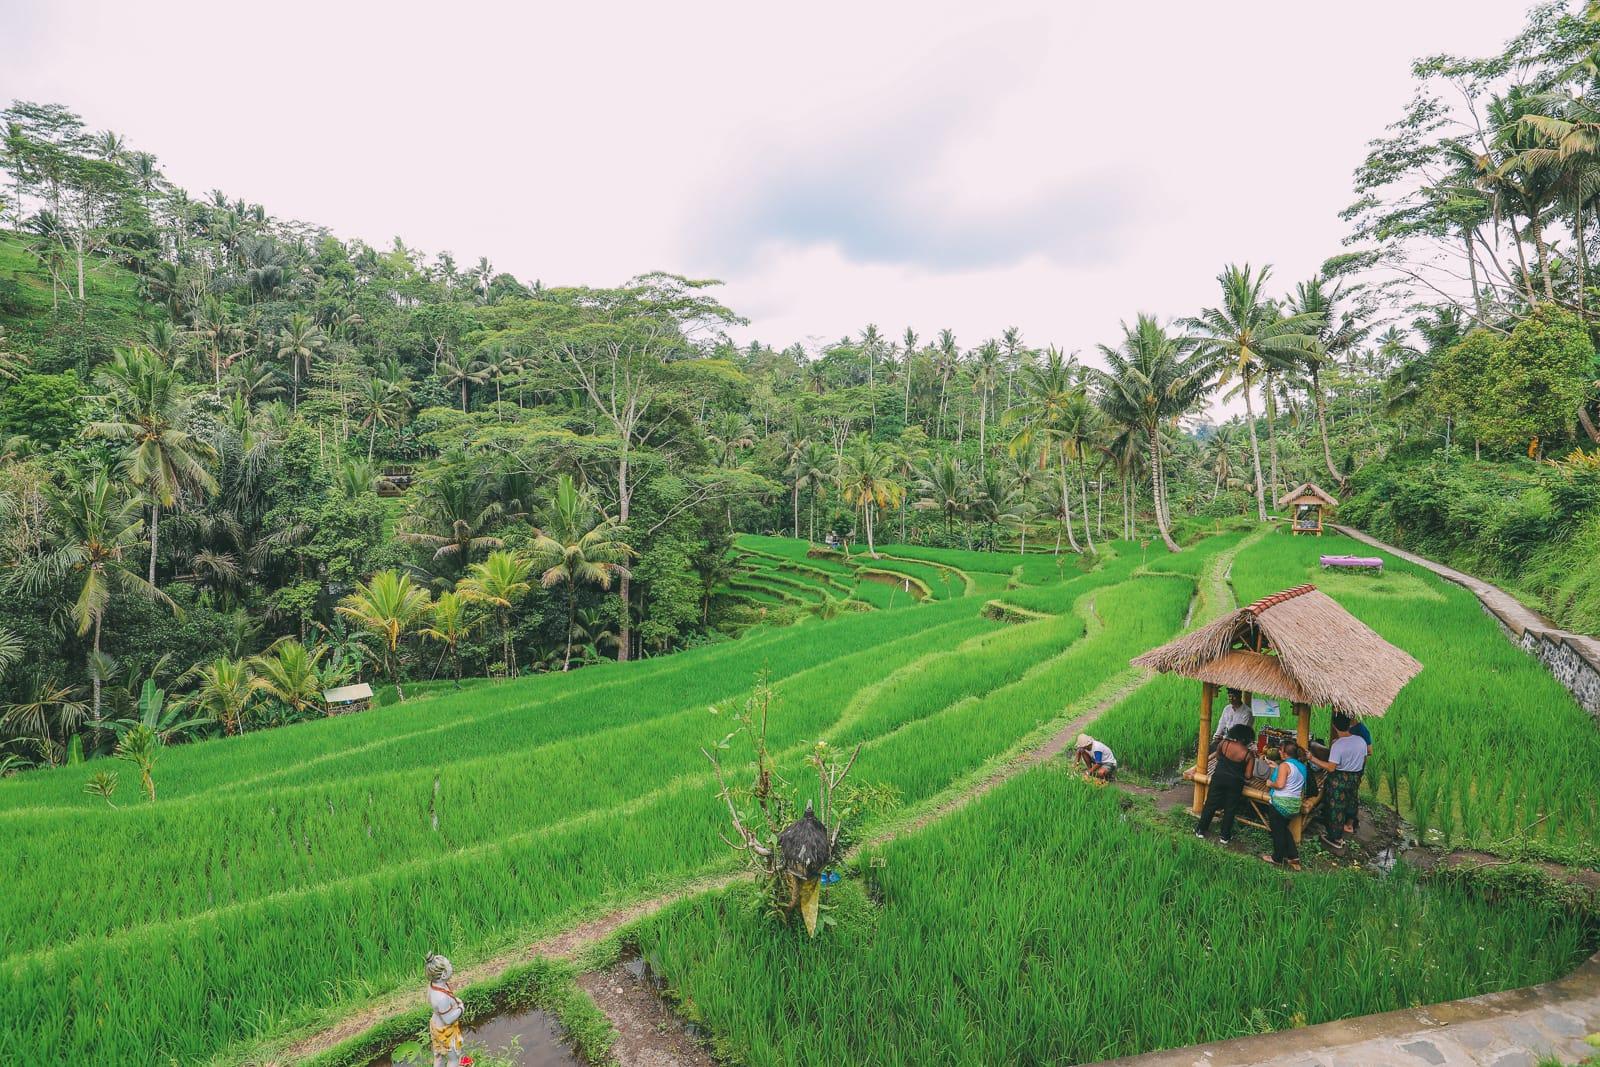 Bali Travel - Tegalalang Rice Terrace In Ubud And Gunung Kawi Temple (26)